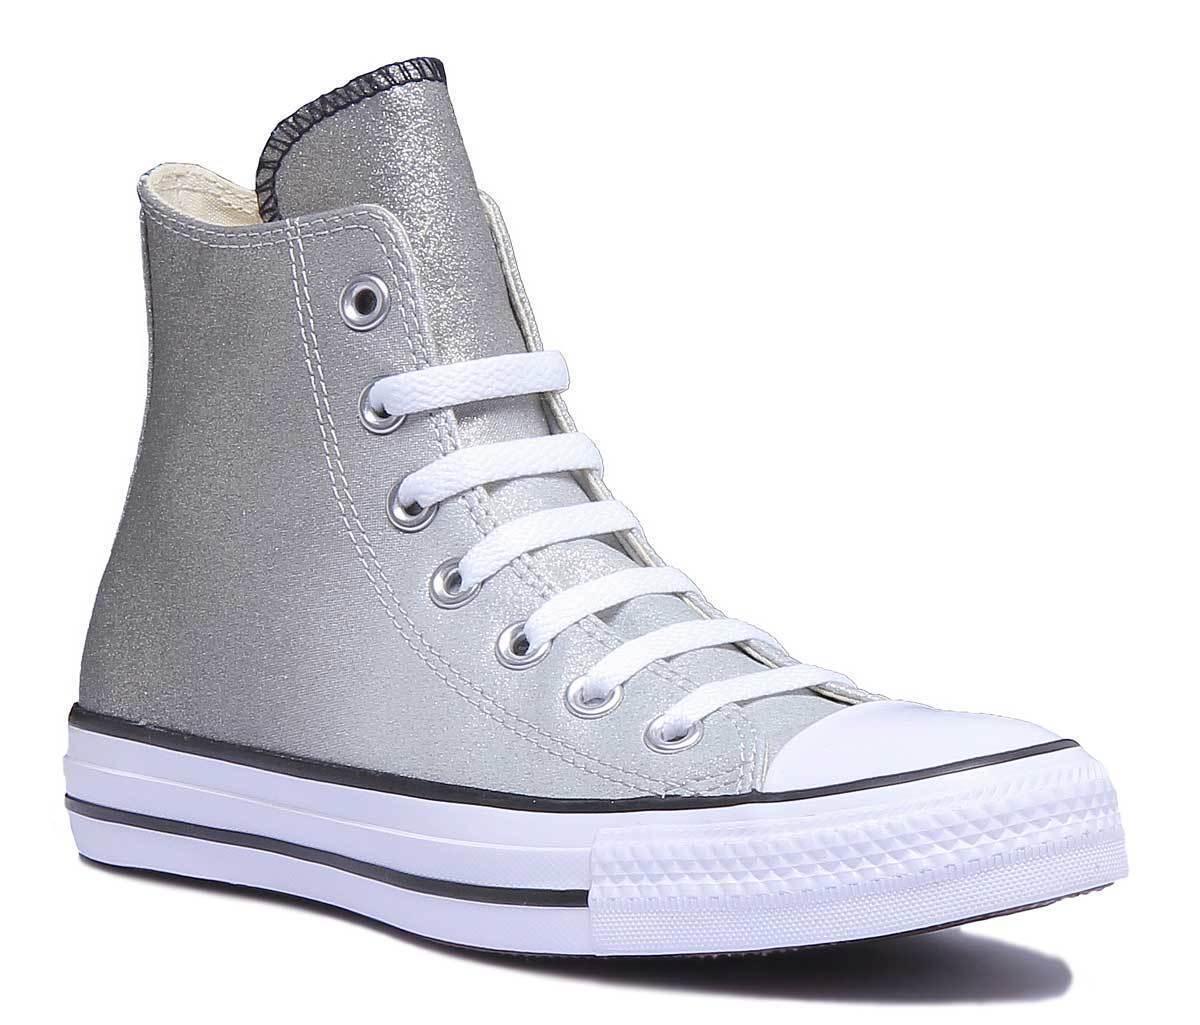 Converse 159523C 159523C 159523C Damenschuhe Silver Other Fabric Trainer Größe UK 3 - 8 6114d2